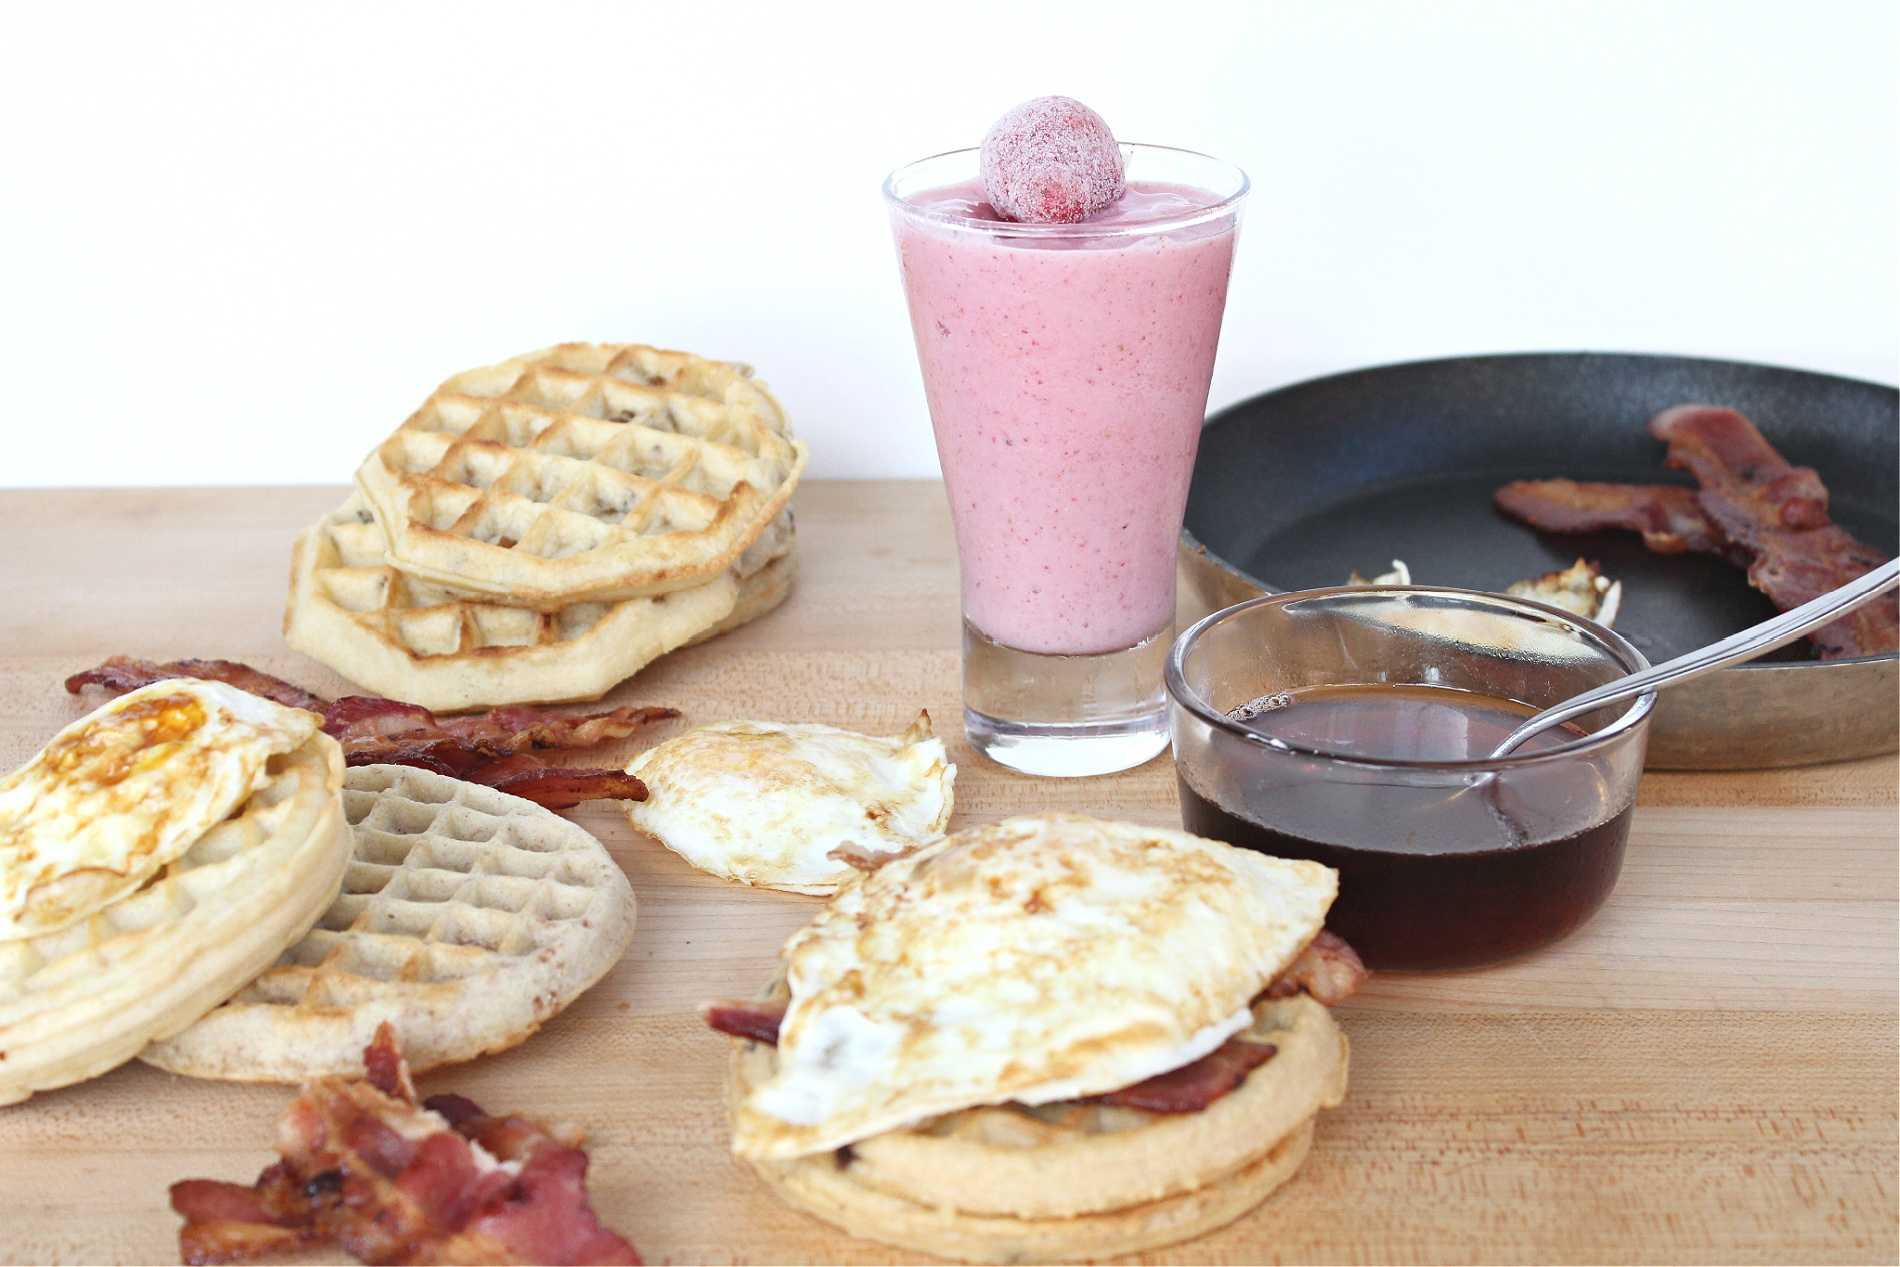 Tasty Waffle Breakfast Sandwiches